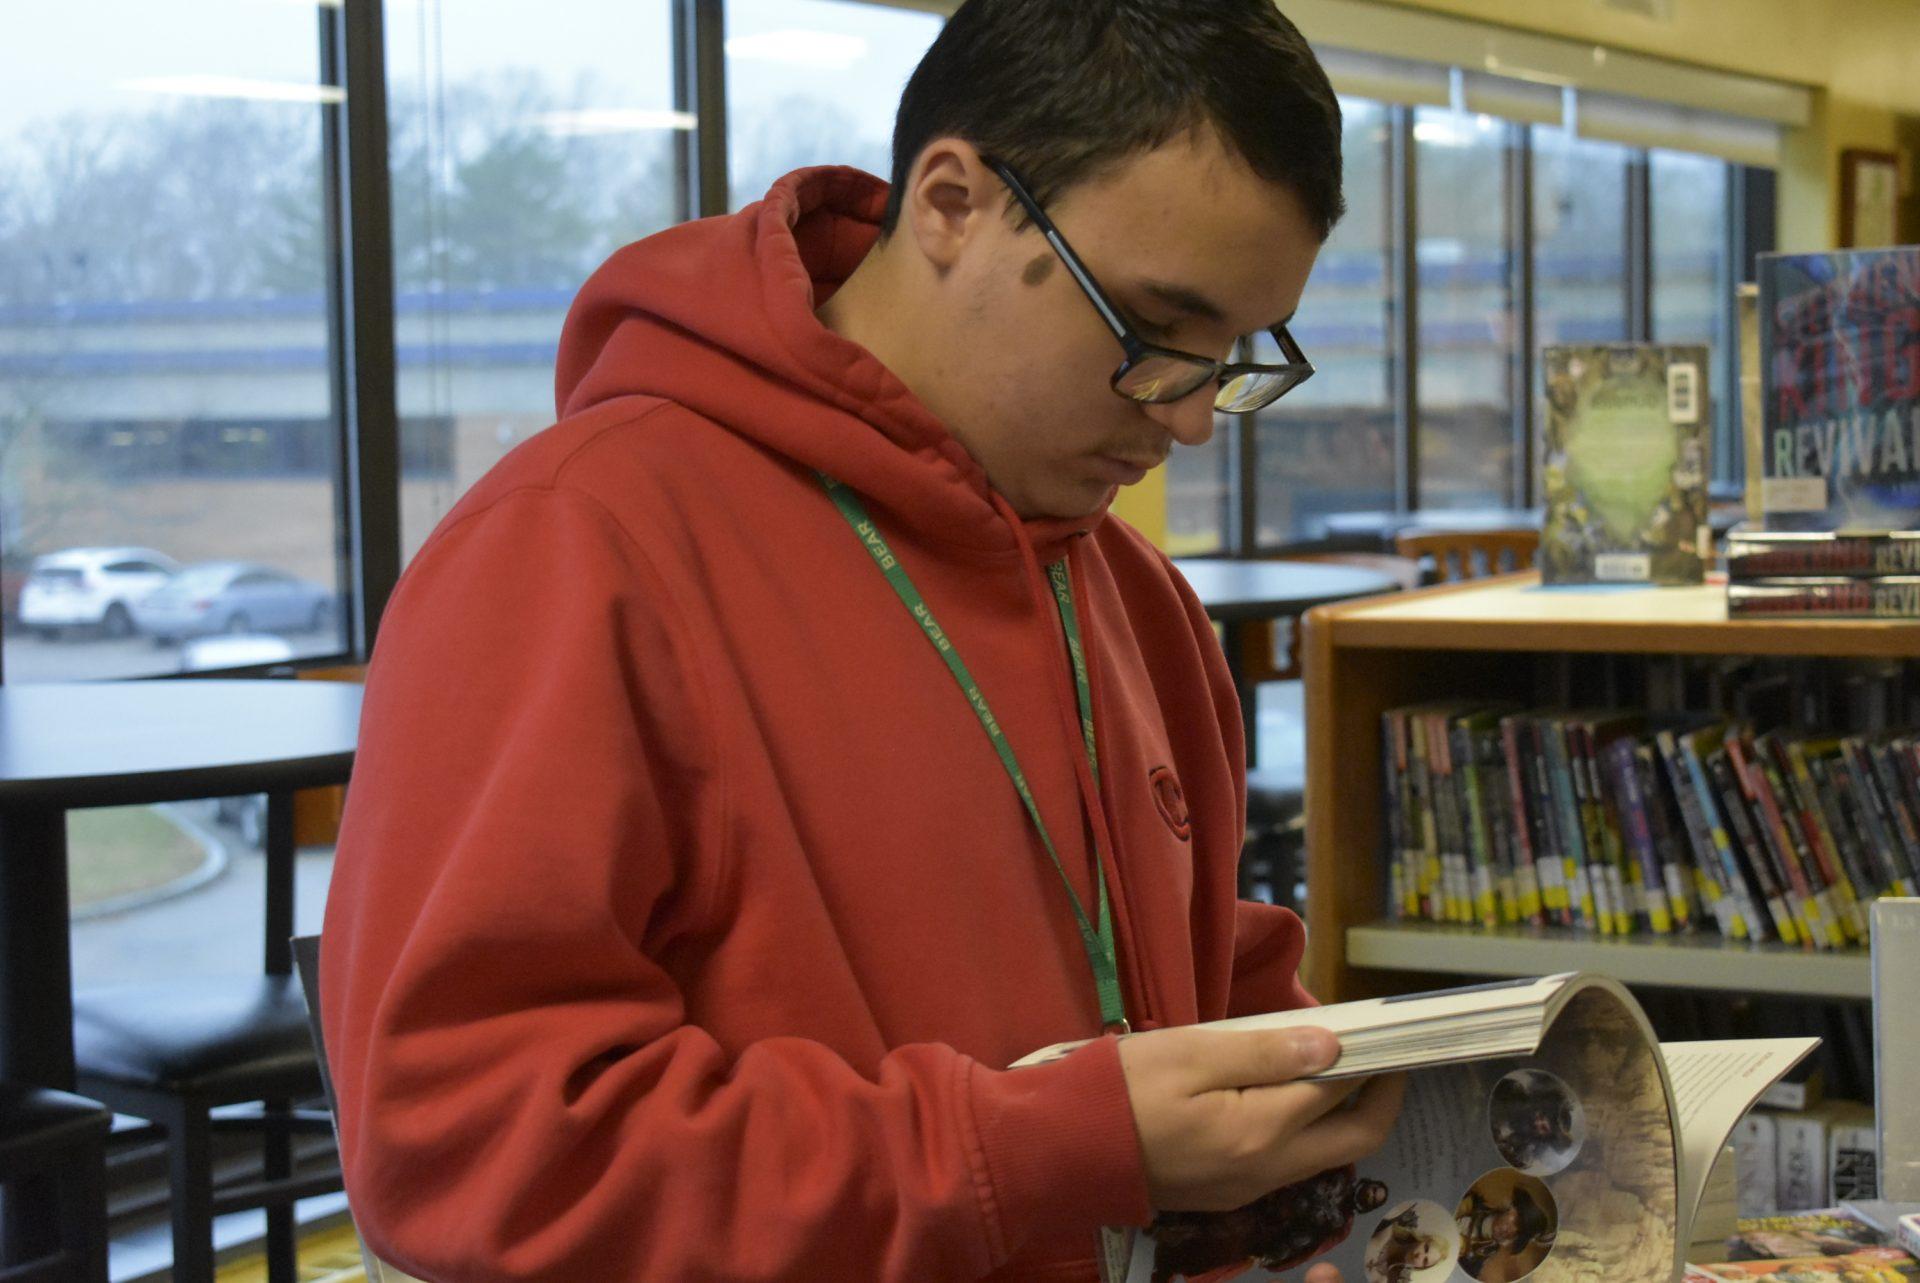 Student in red hoodie looking through book